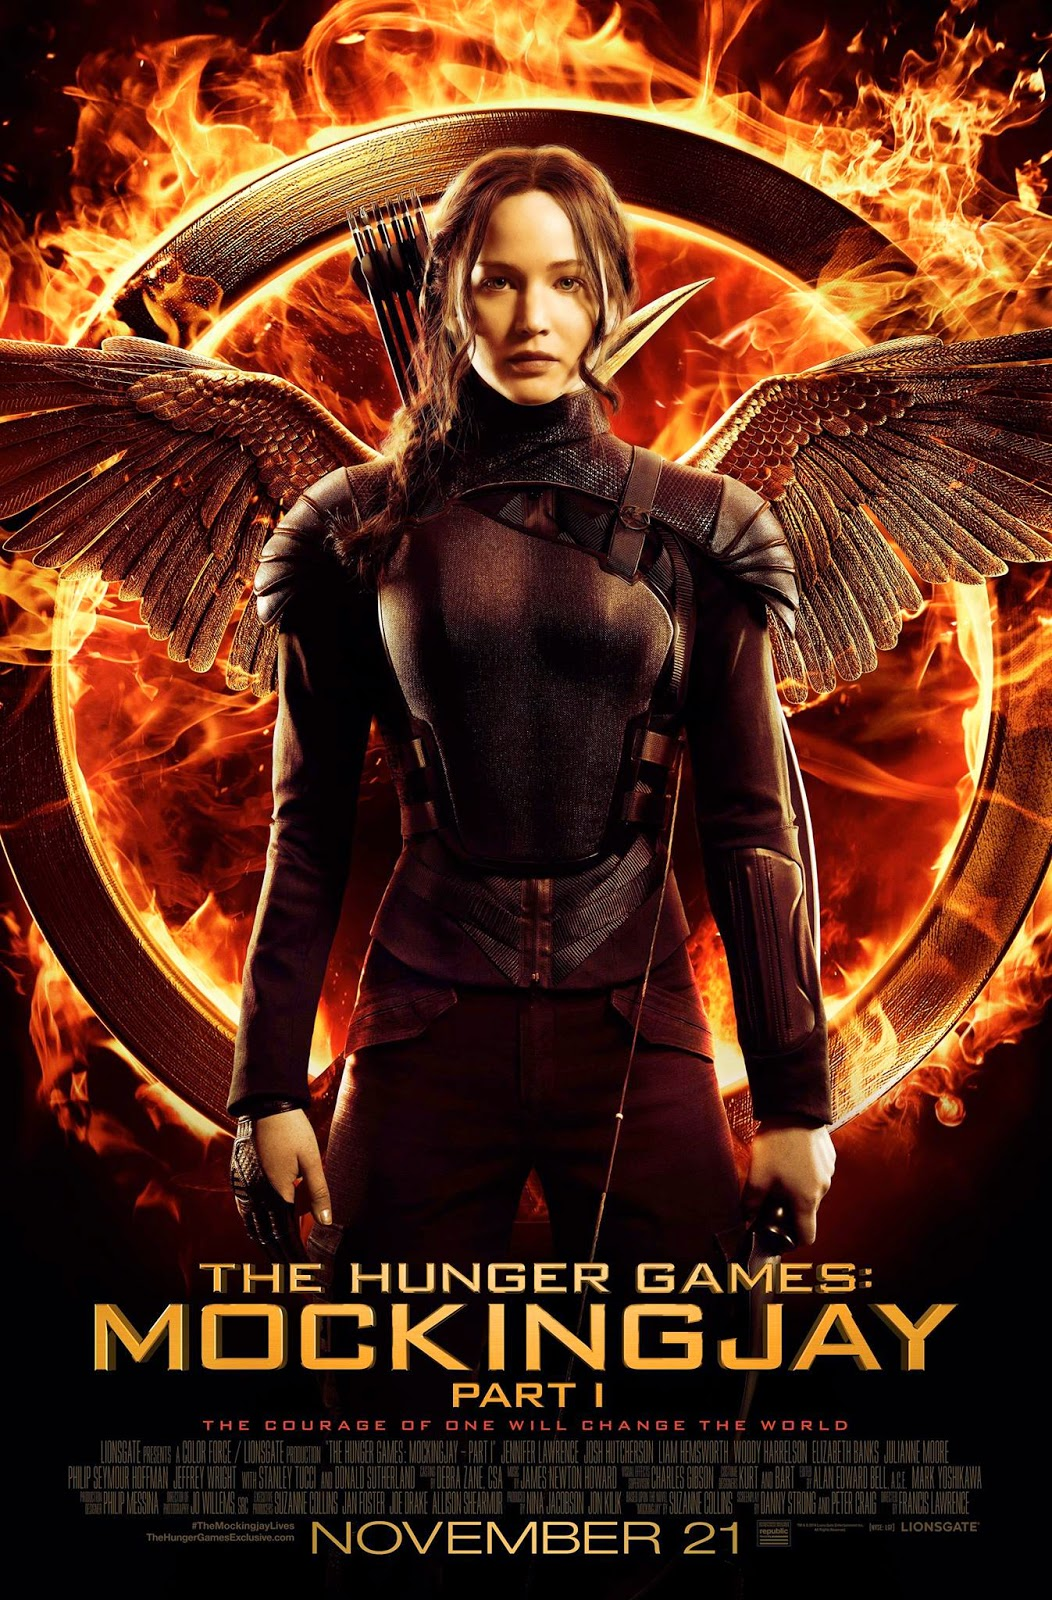 The Hunger Games Mockingjay Part 1 เกมล่าเกม 3  เดอะ ฮังเกอร์เกมส์ ม็อคกิ้งเจย์ พาร์ท1 [HD]